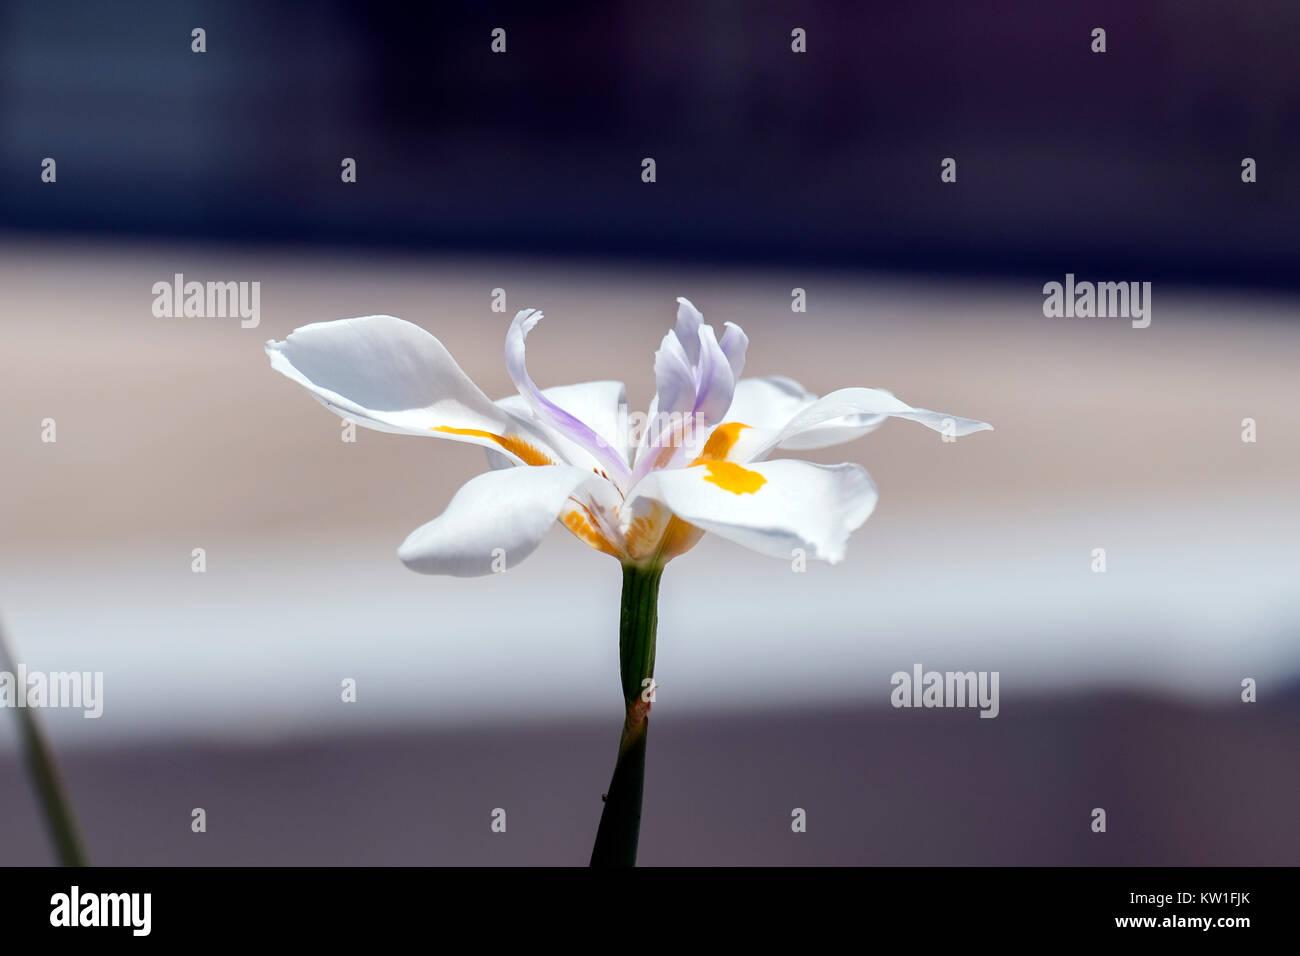 Flower of large wild iris with yellow veins on petals (Dietes grandiflora) - Stock Image